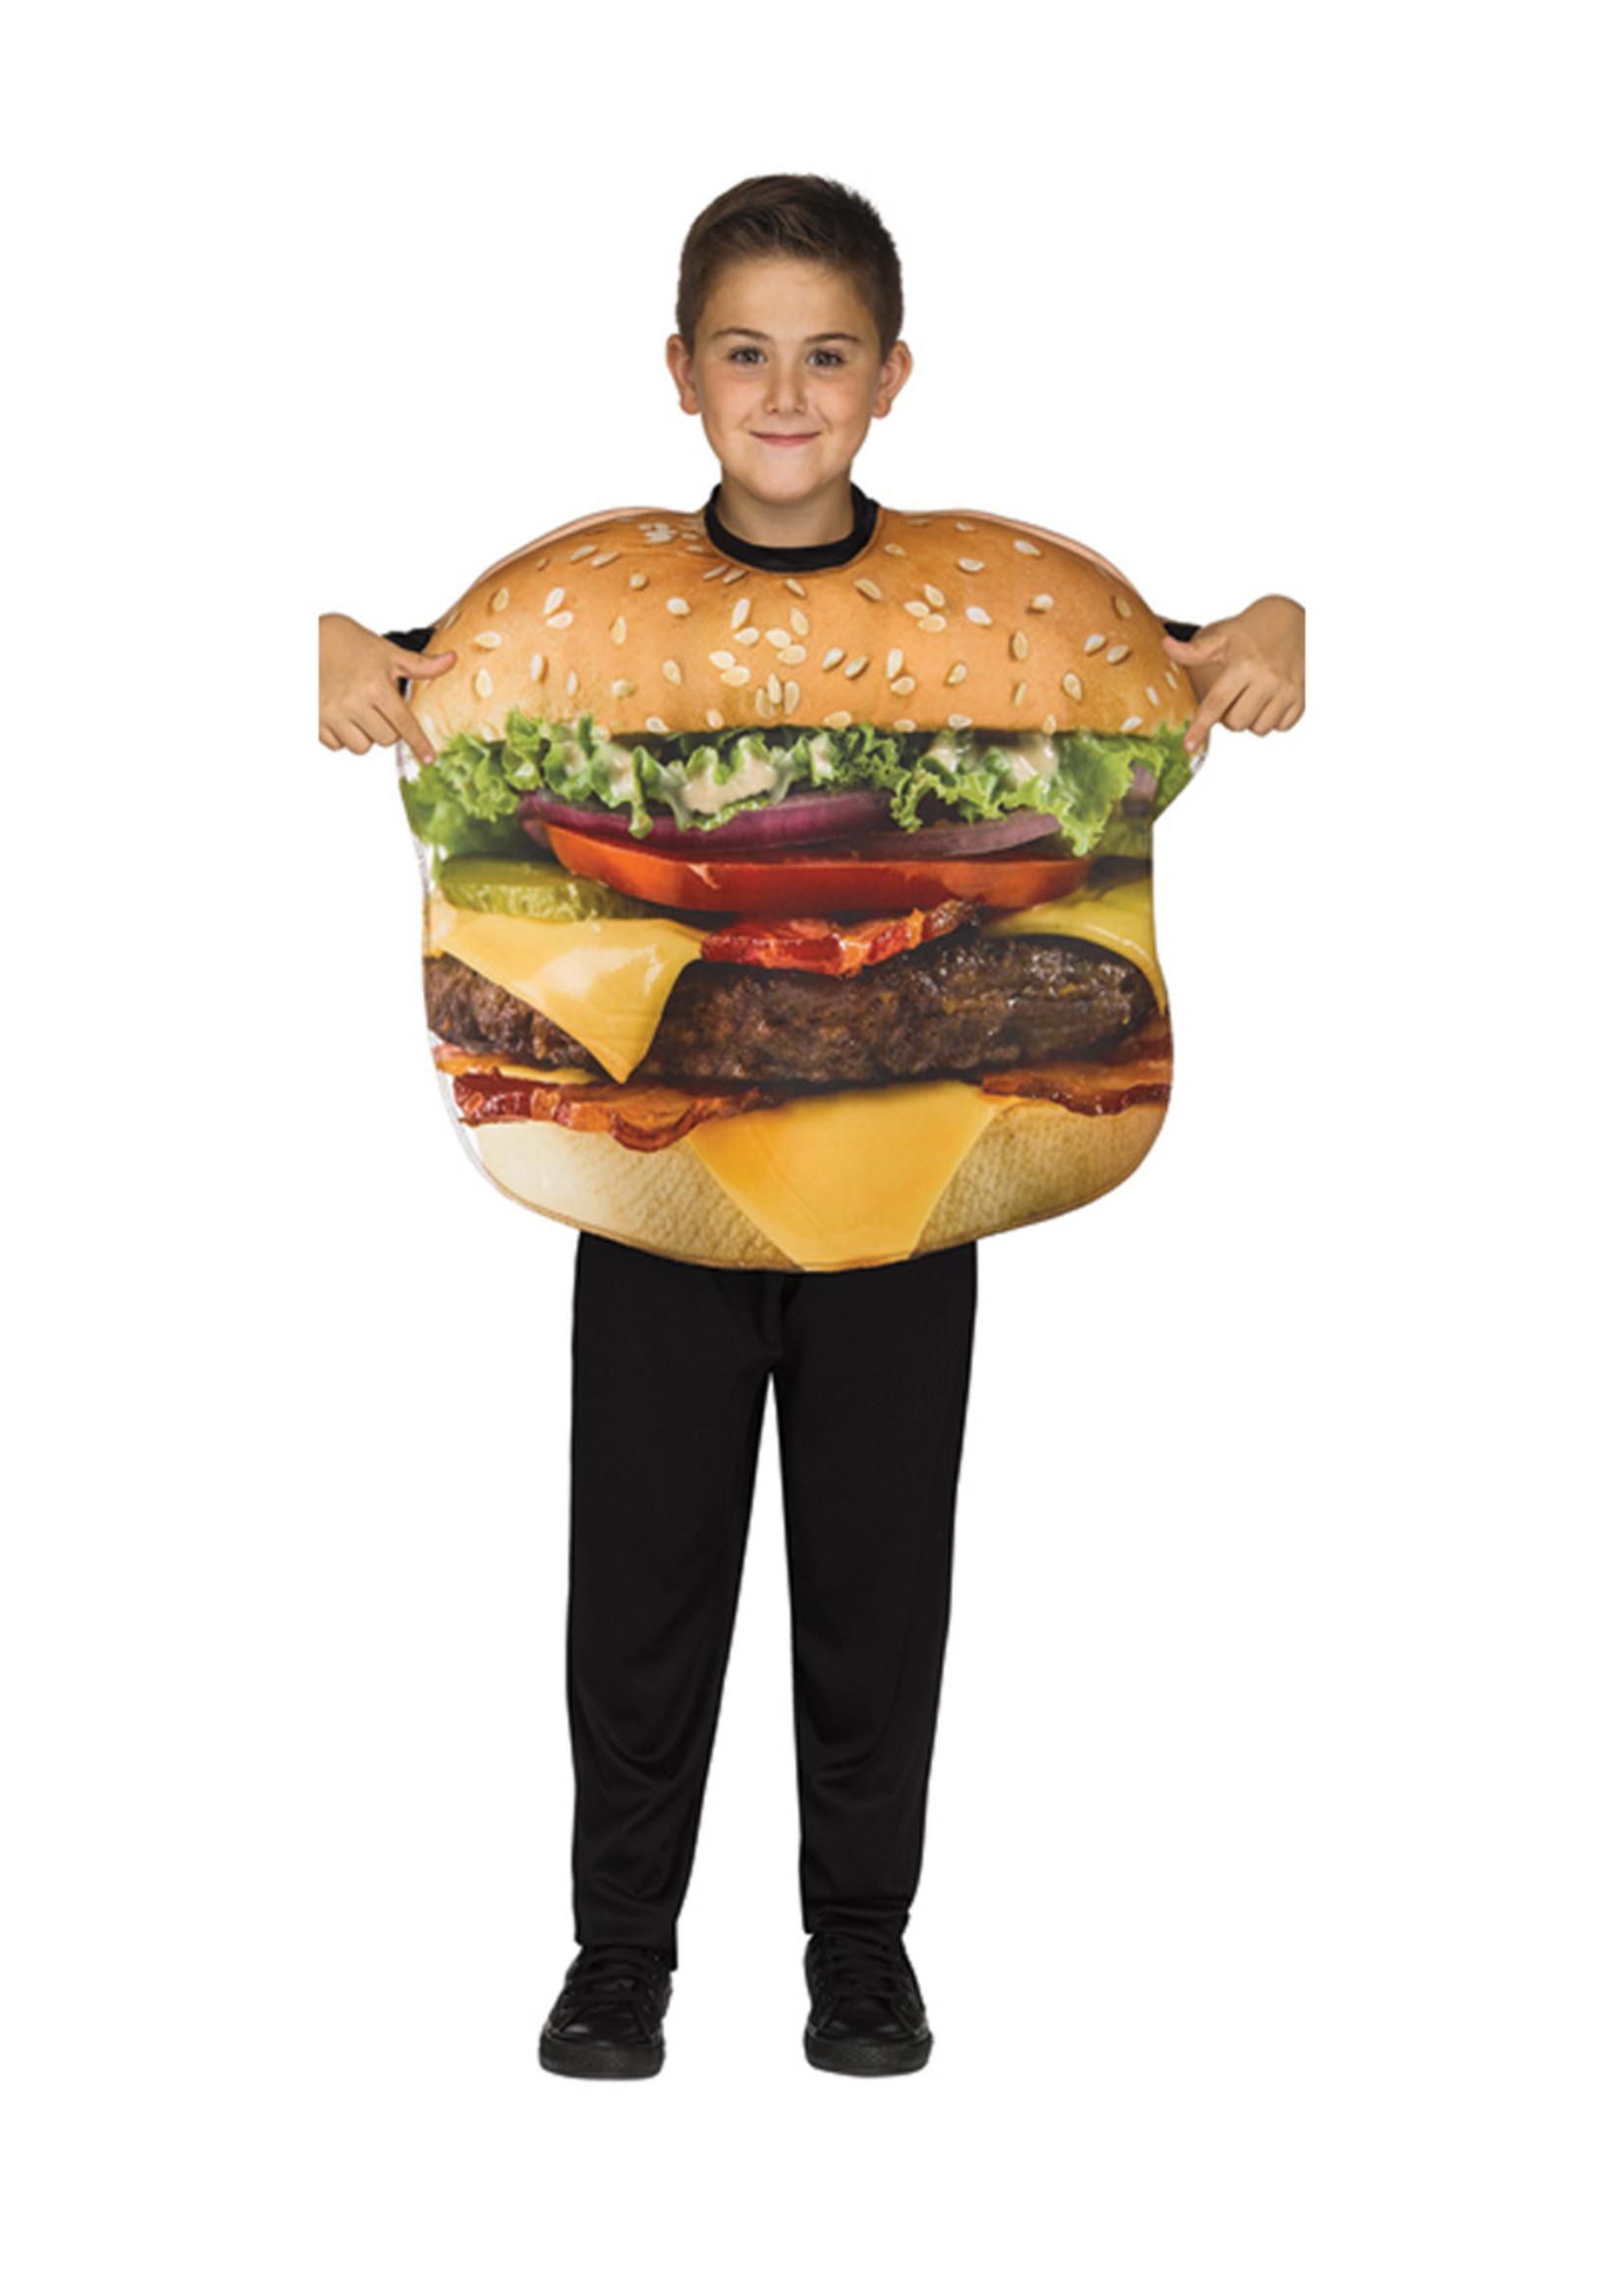 Cheeseburger Costume - Boys